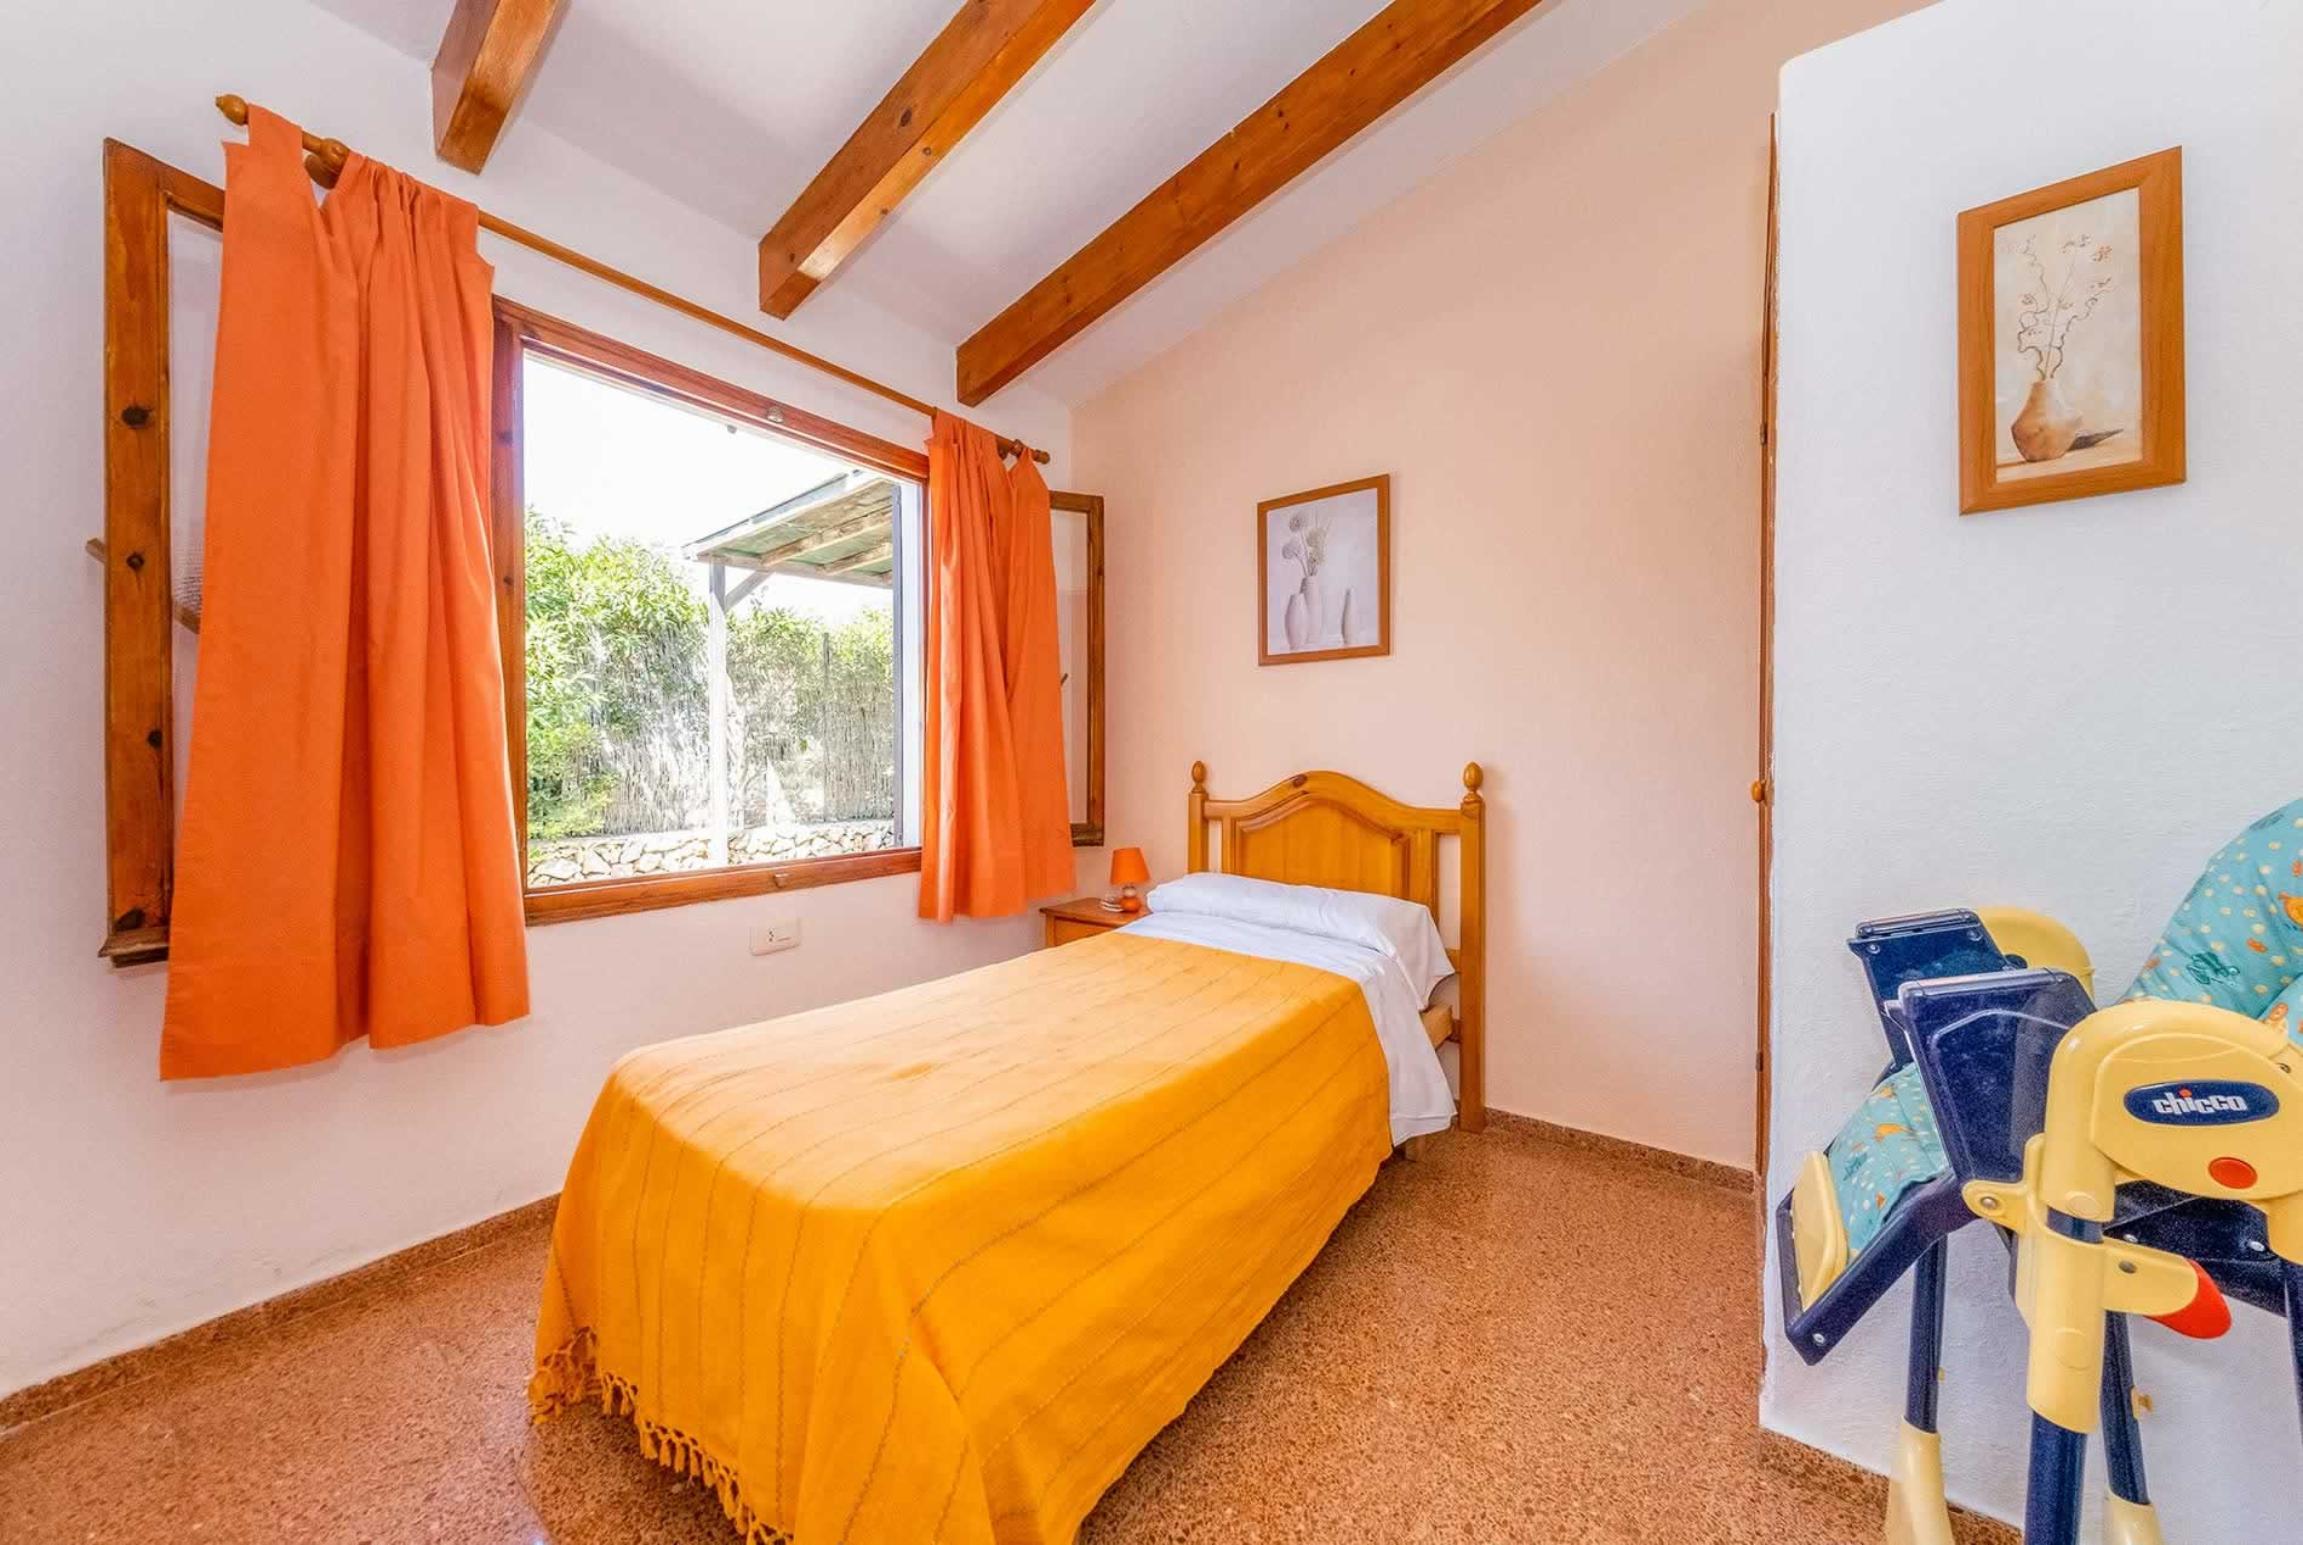 Ferienhaus Iris Prima (2653680), Punta Prima, Menorca, Balearische Inseln, Spanien, Bild 27